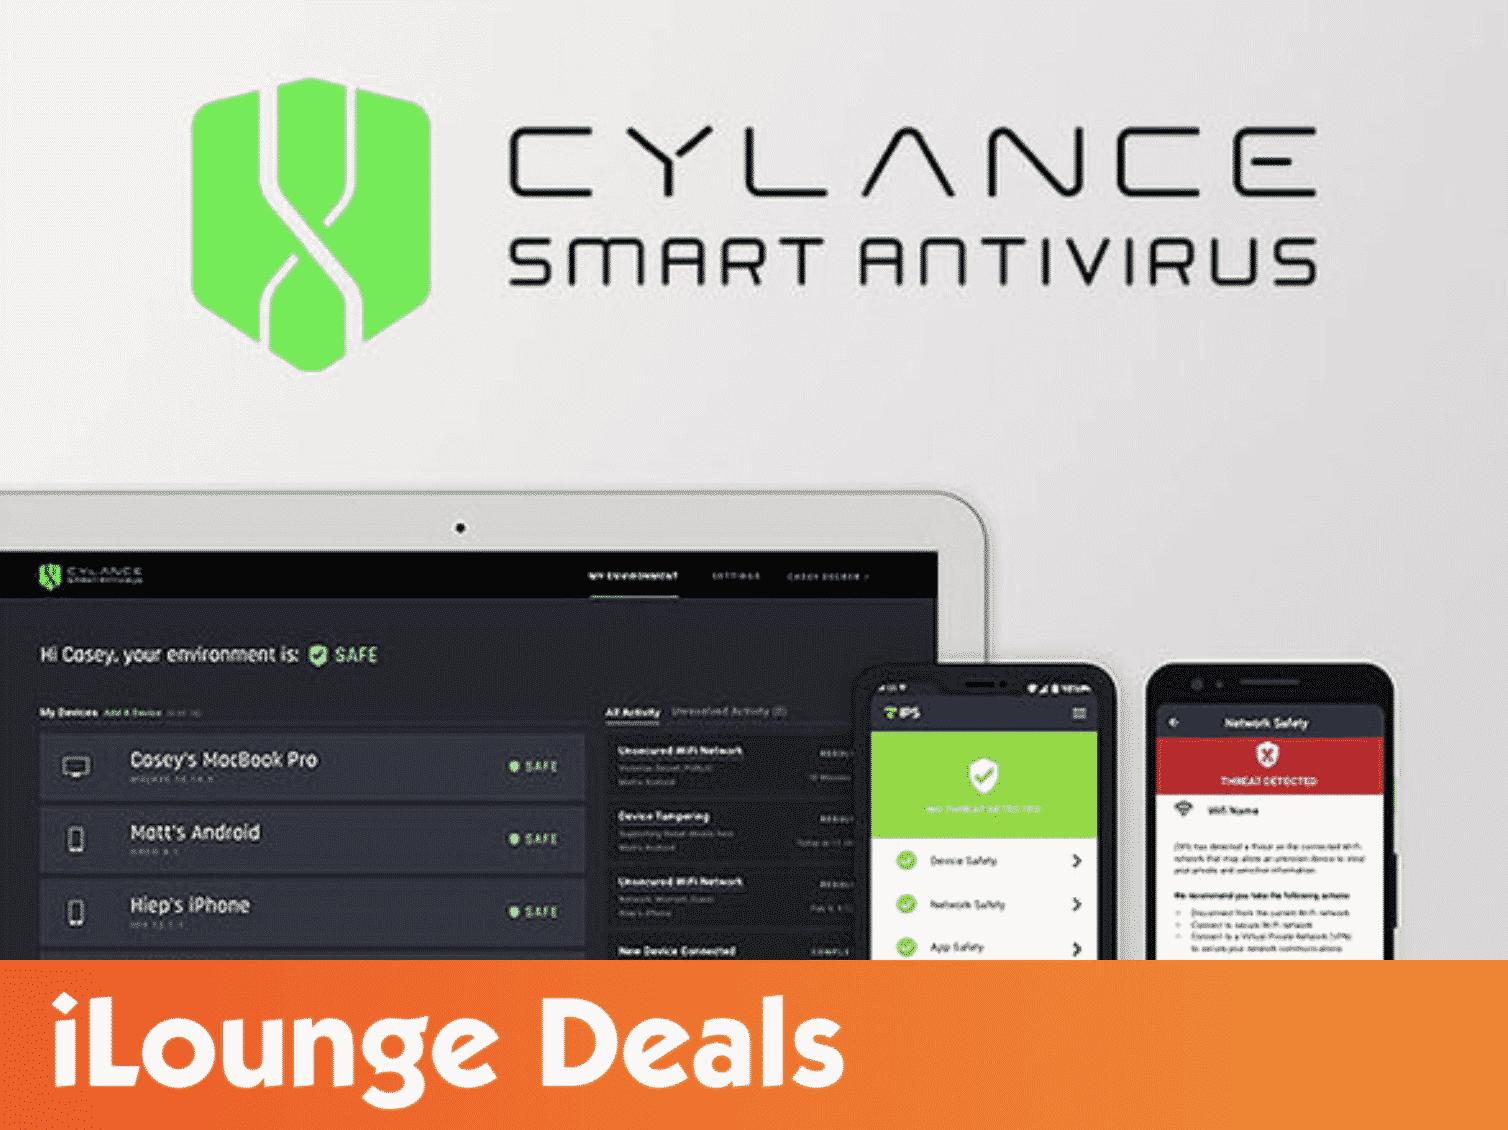 Cylance Smart Antivirus for Mac & Windows